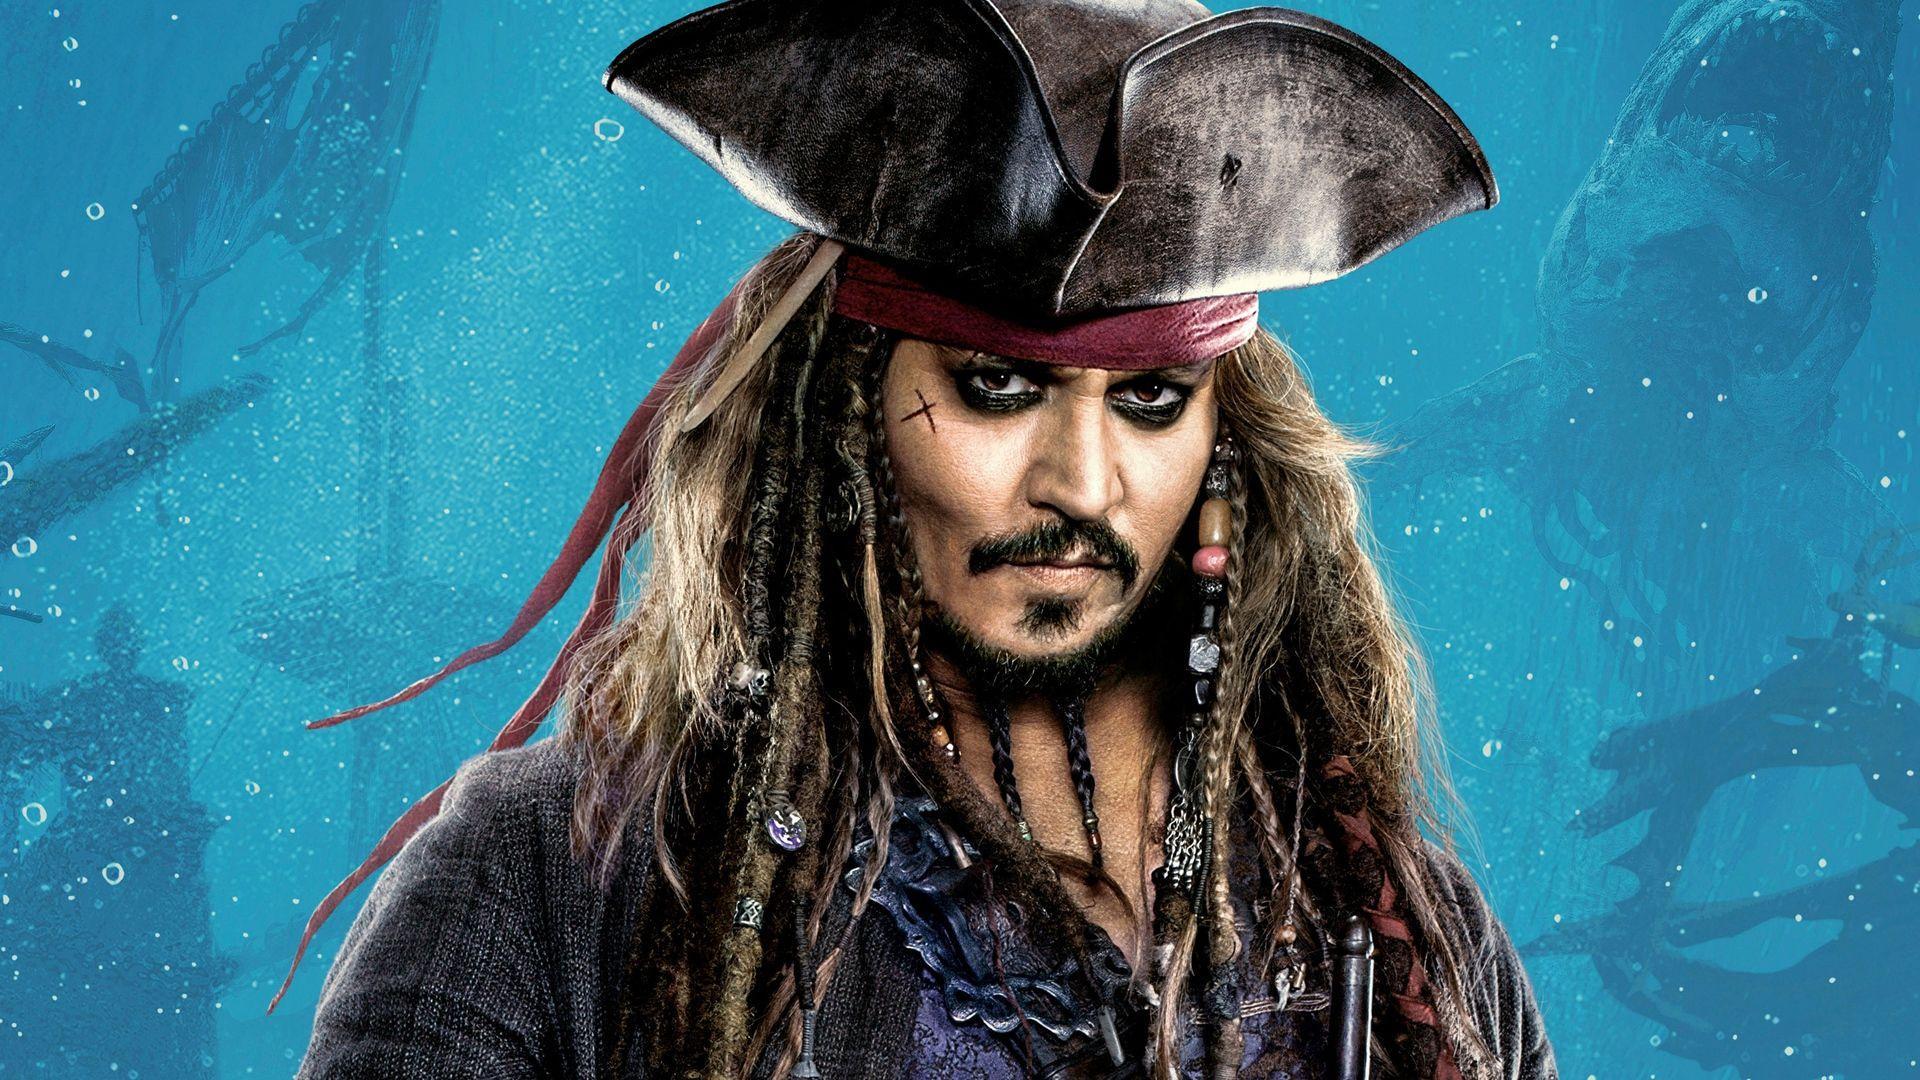 Jack Sparrow Wallpapers - Top Free Jack Sparrow ...